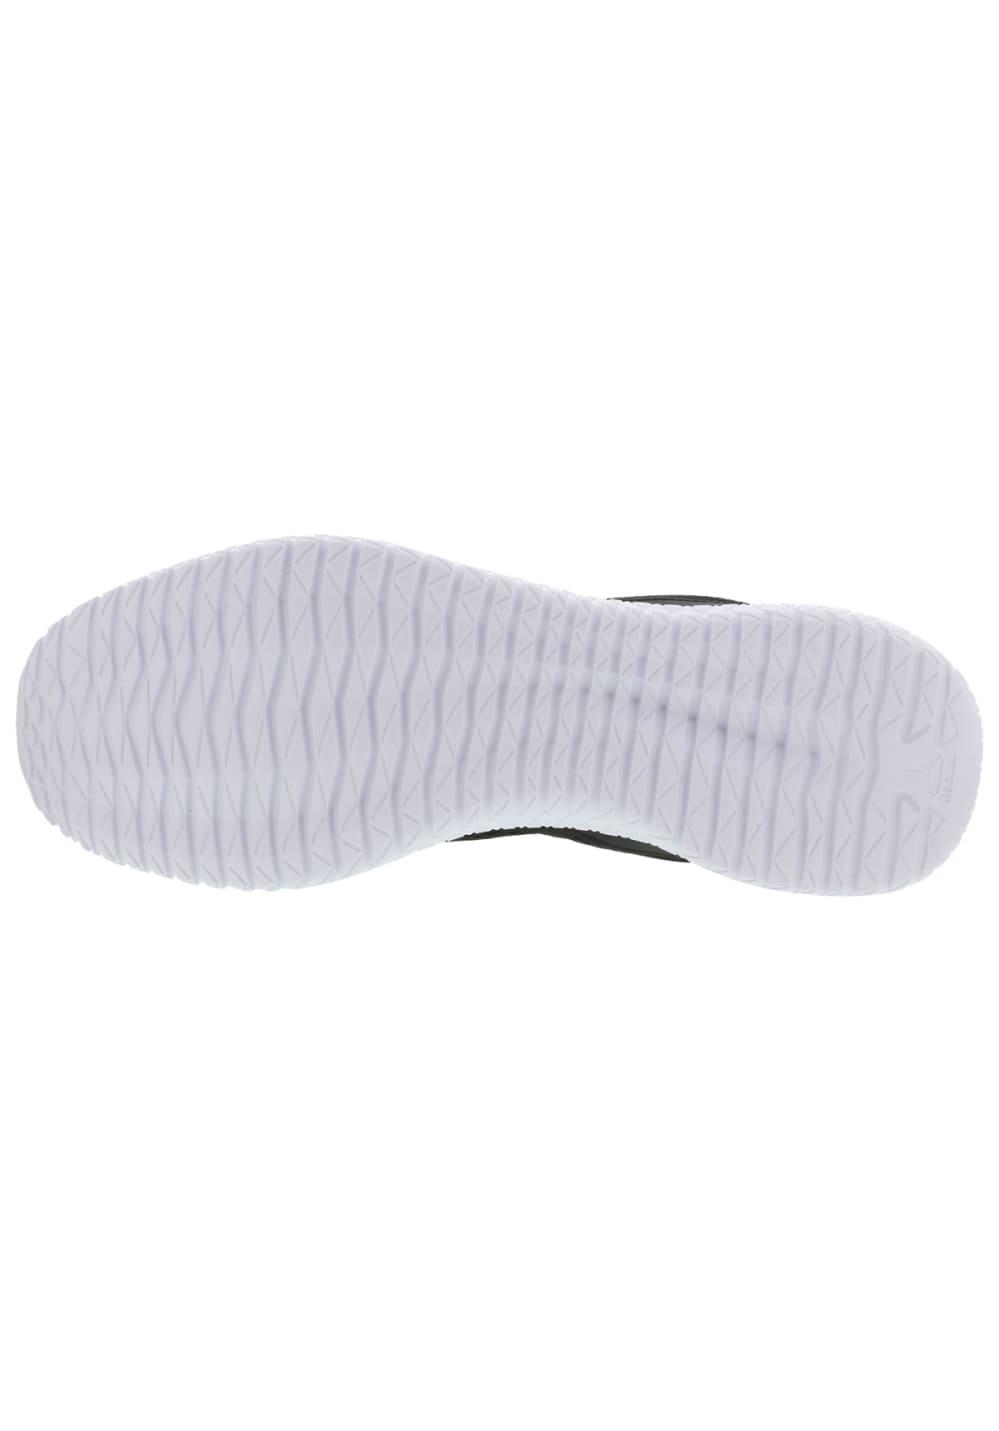 5c661d3ac Reebok Flexagon Energy - Zapatillas de fitness para Mujer - Negro ...